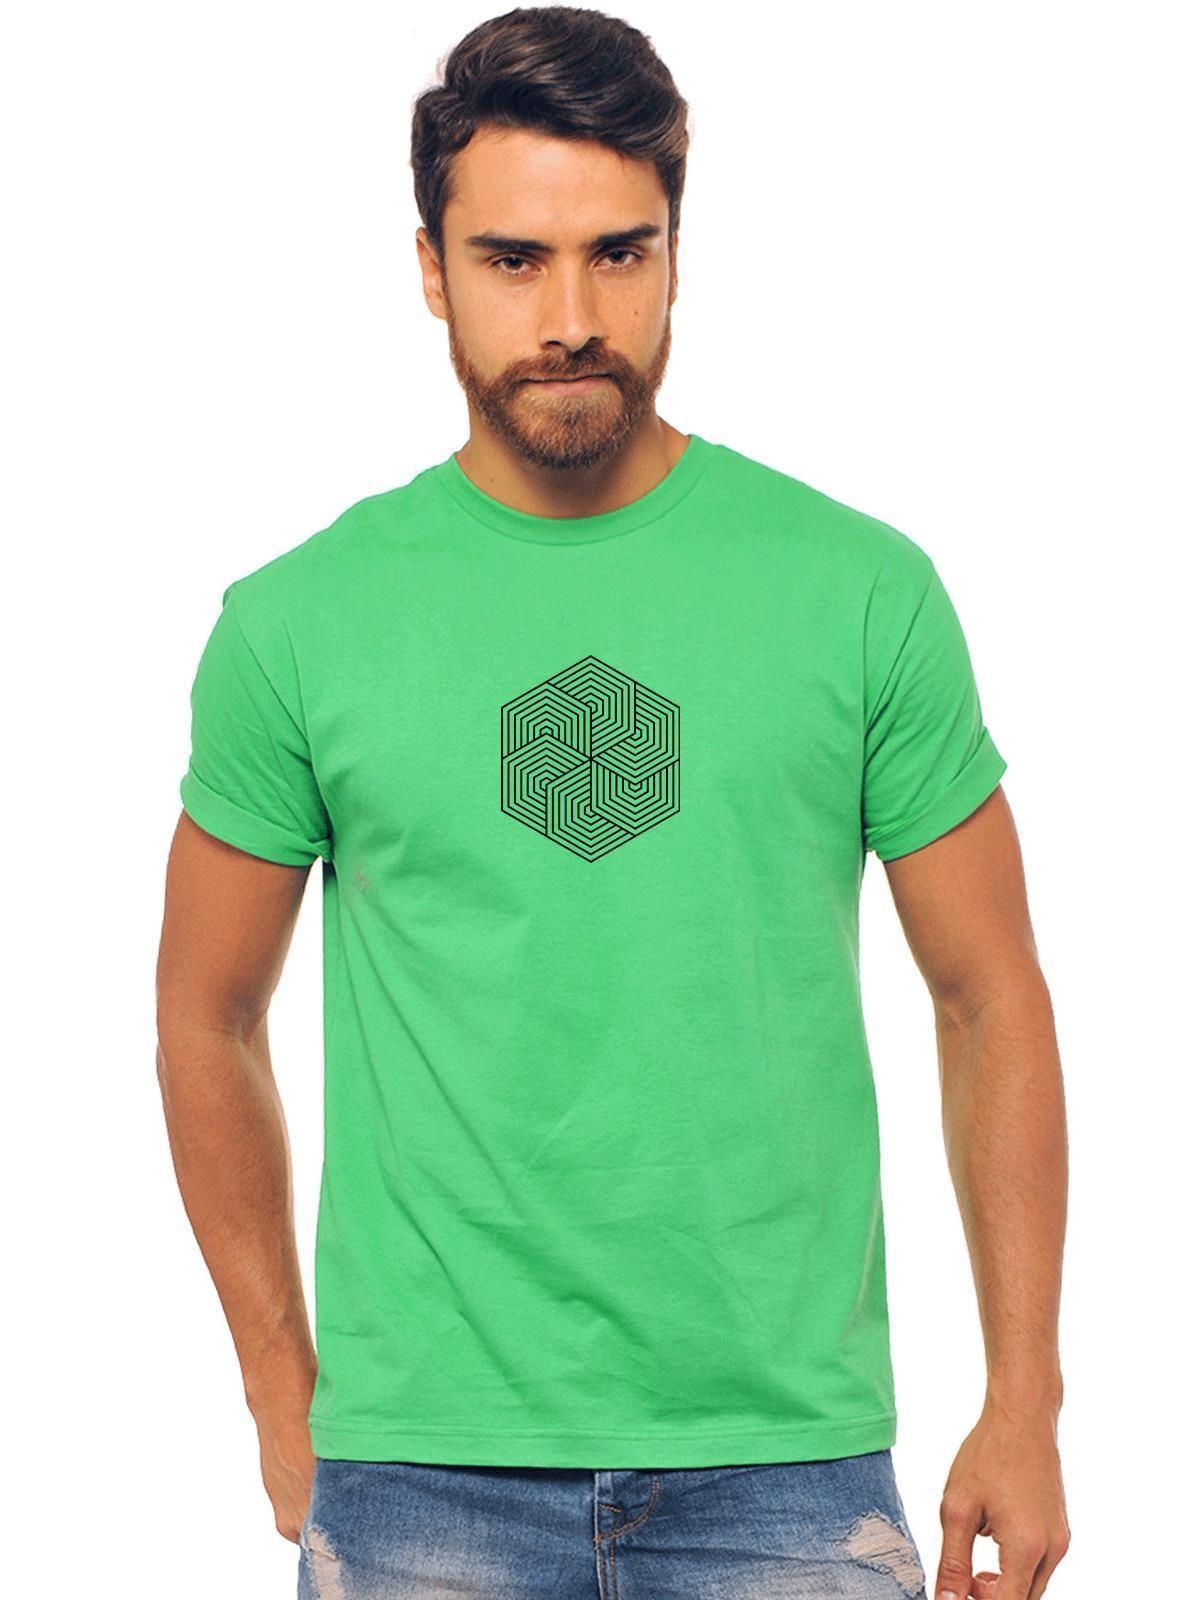 58e774a22 Camiseta Verde Estampada Masculina Joss - Flor Doida - CAMISETA VERDE  ESTAMPADO MASCULINO JOSS